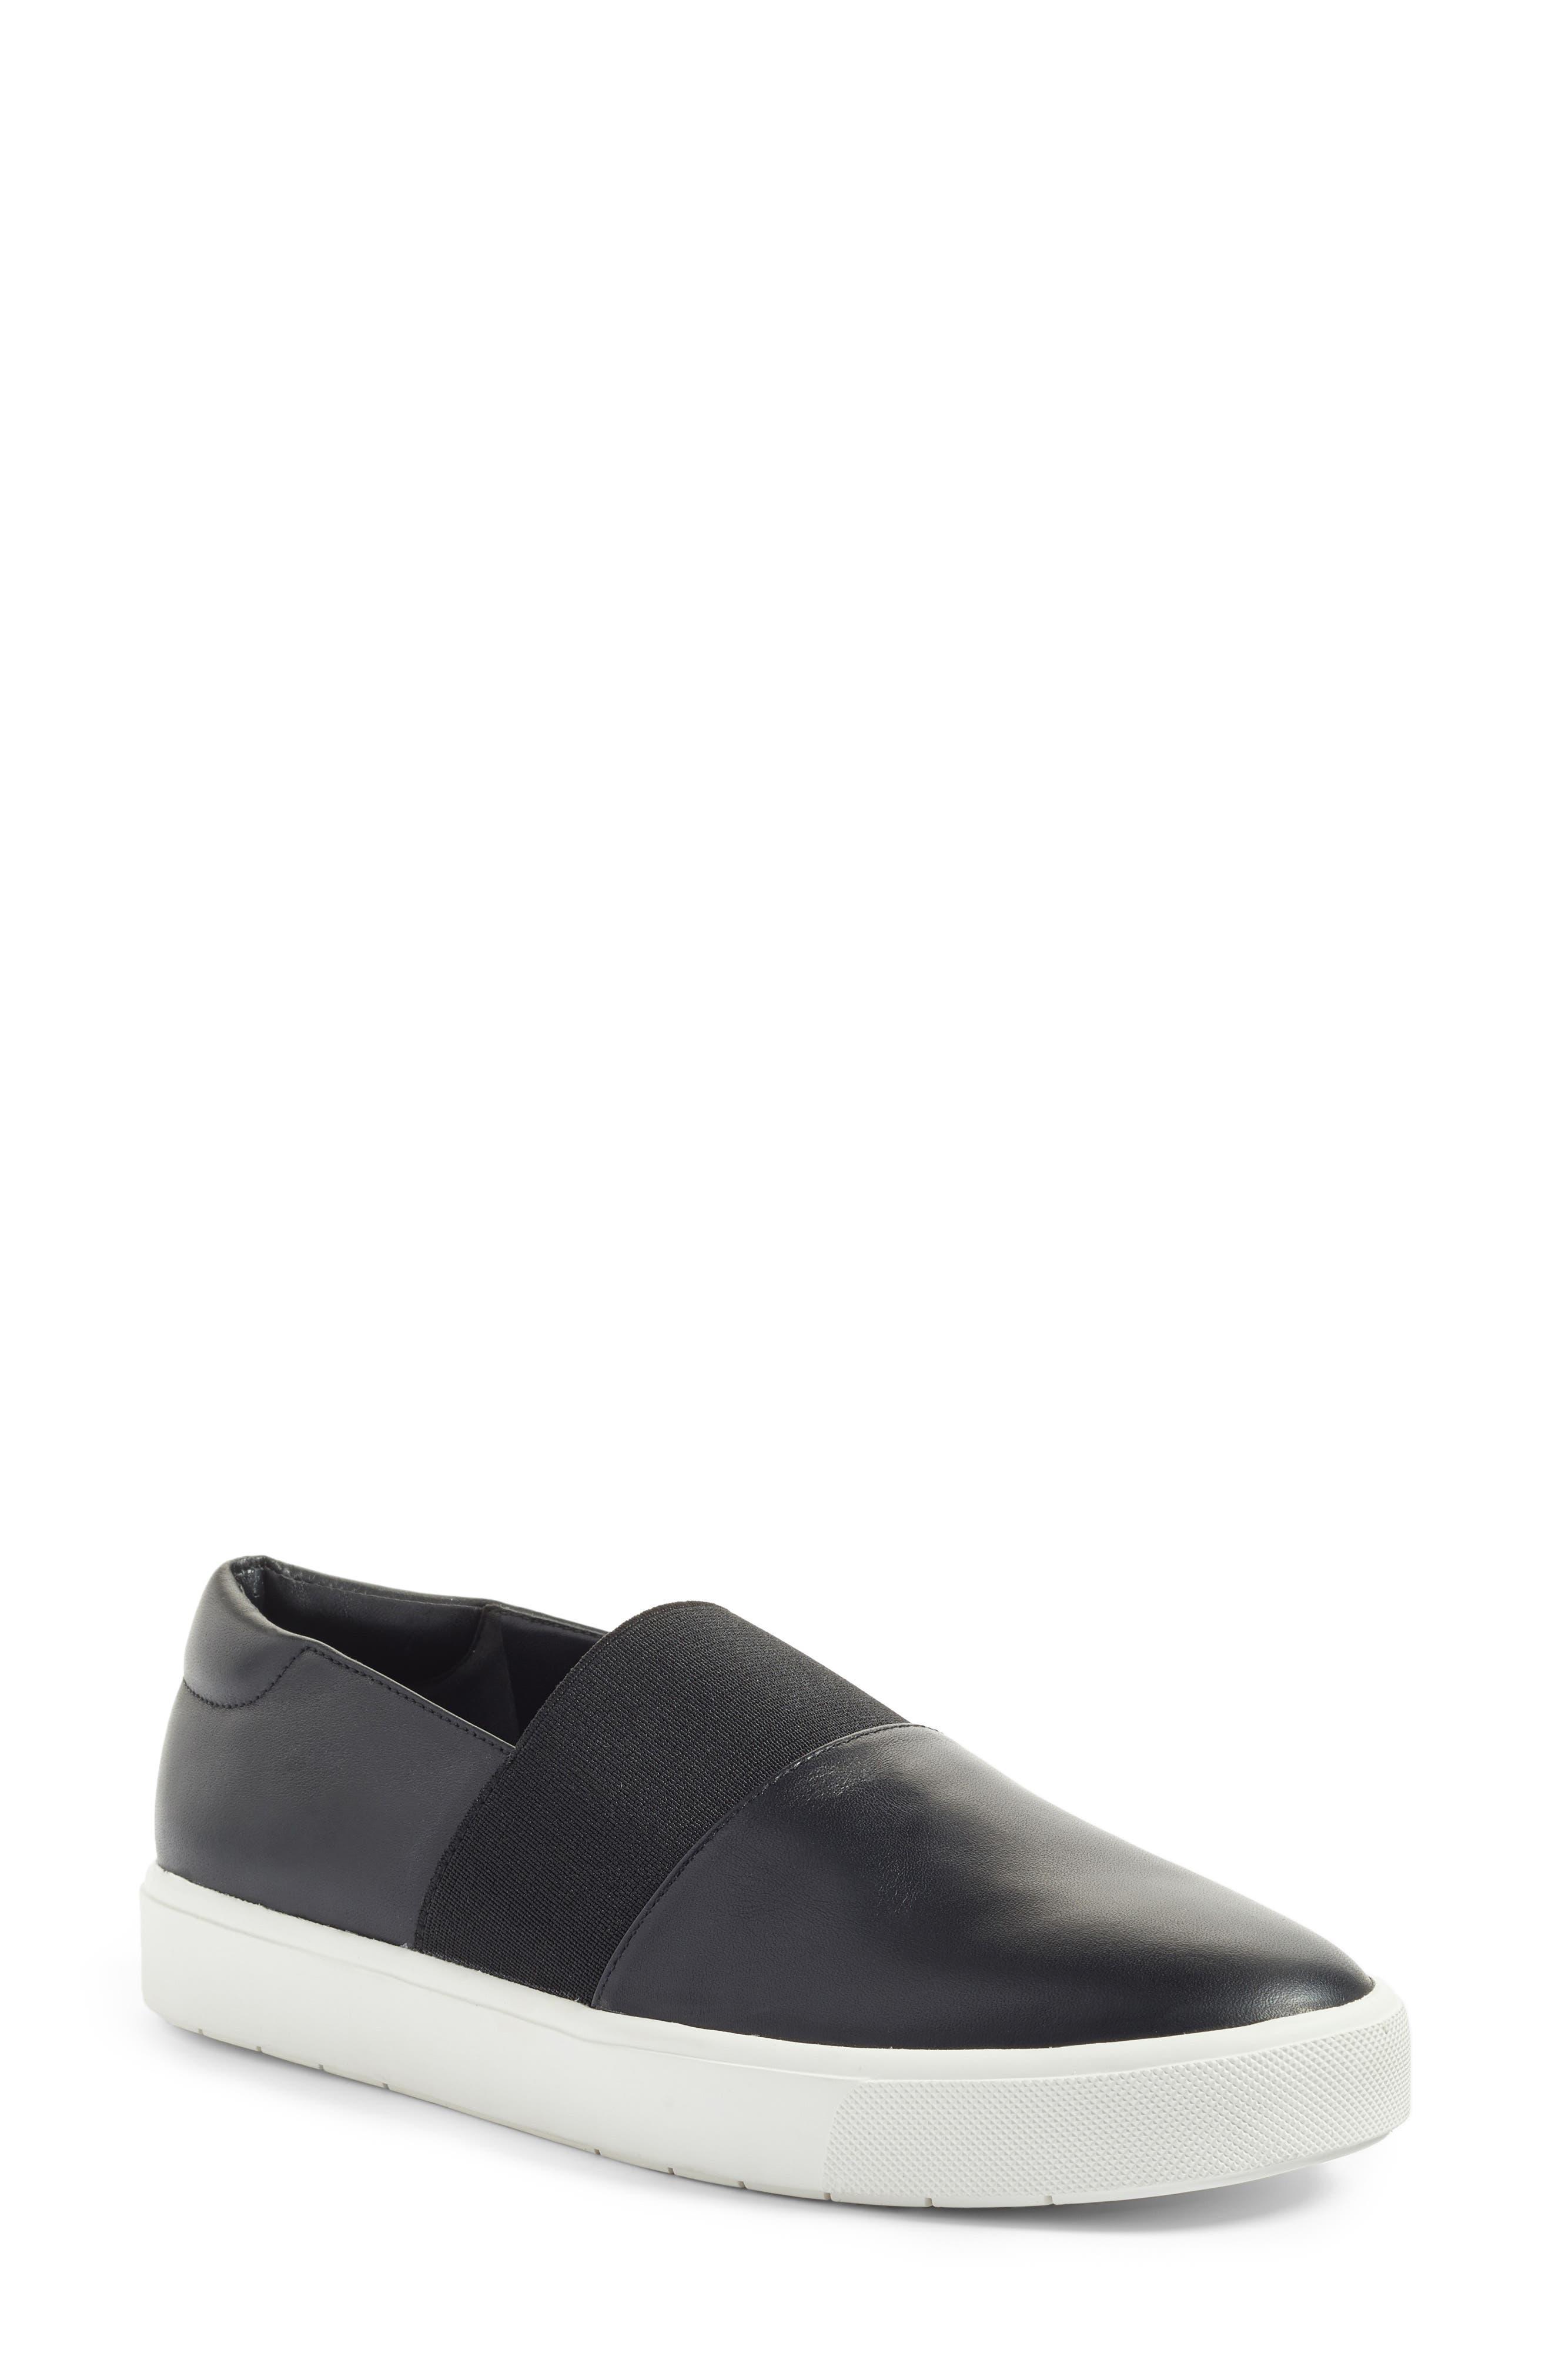 Corbin Slip-On Sneaker,                             Main thumbnail 1, color,                             001